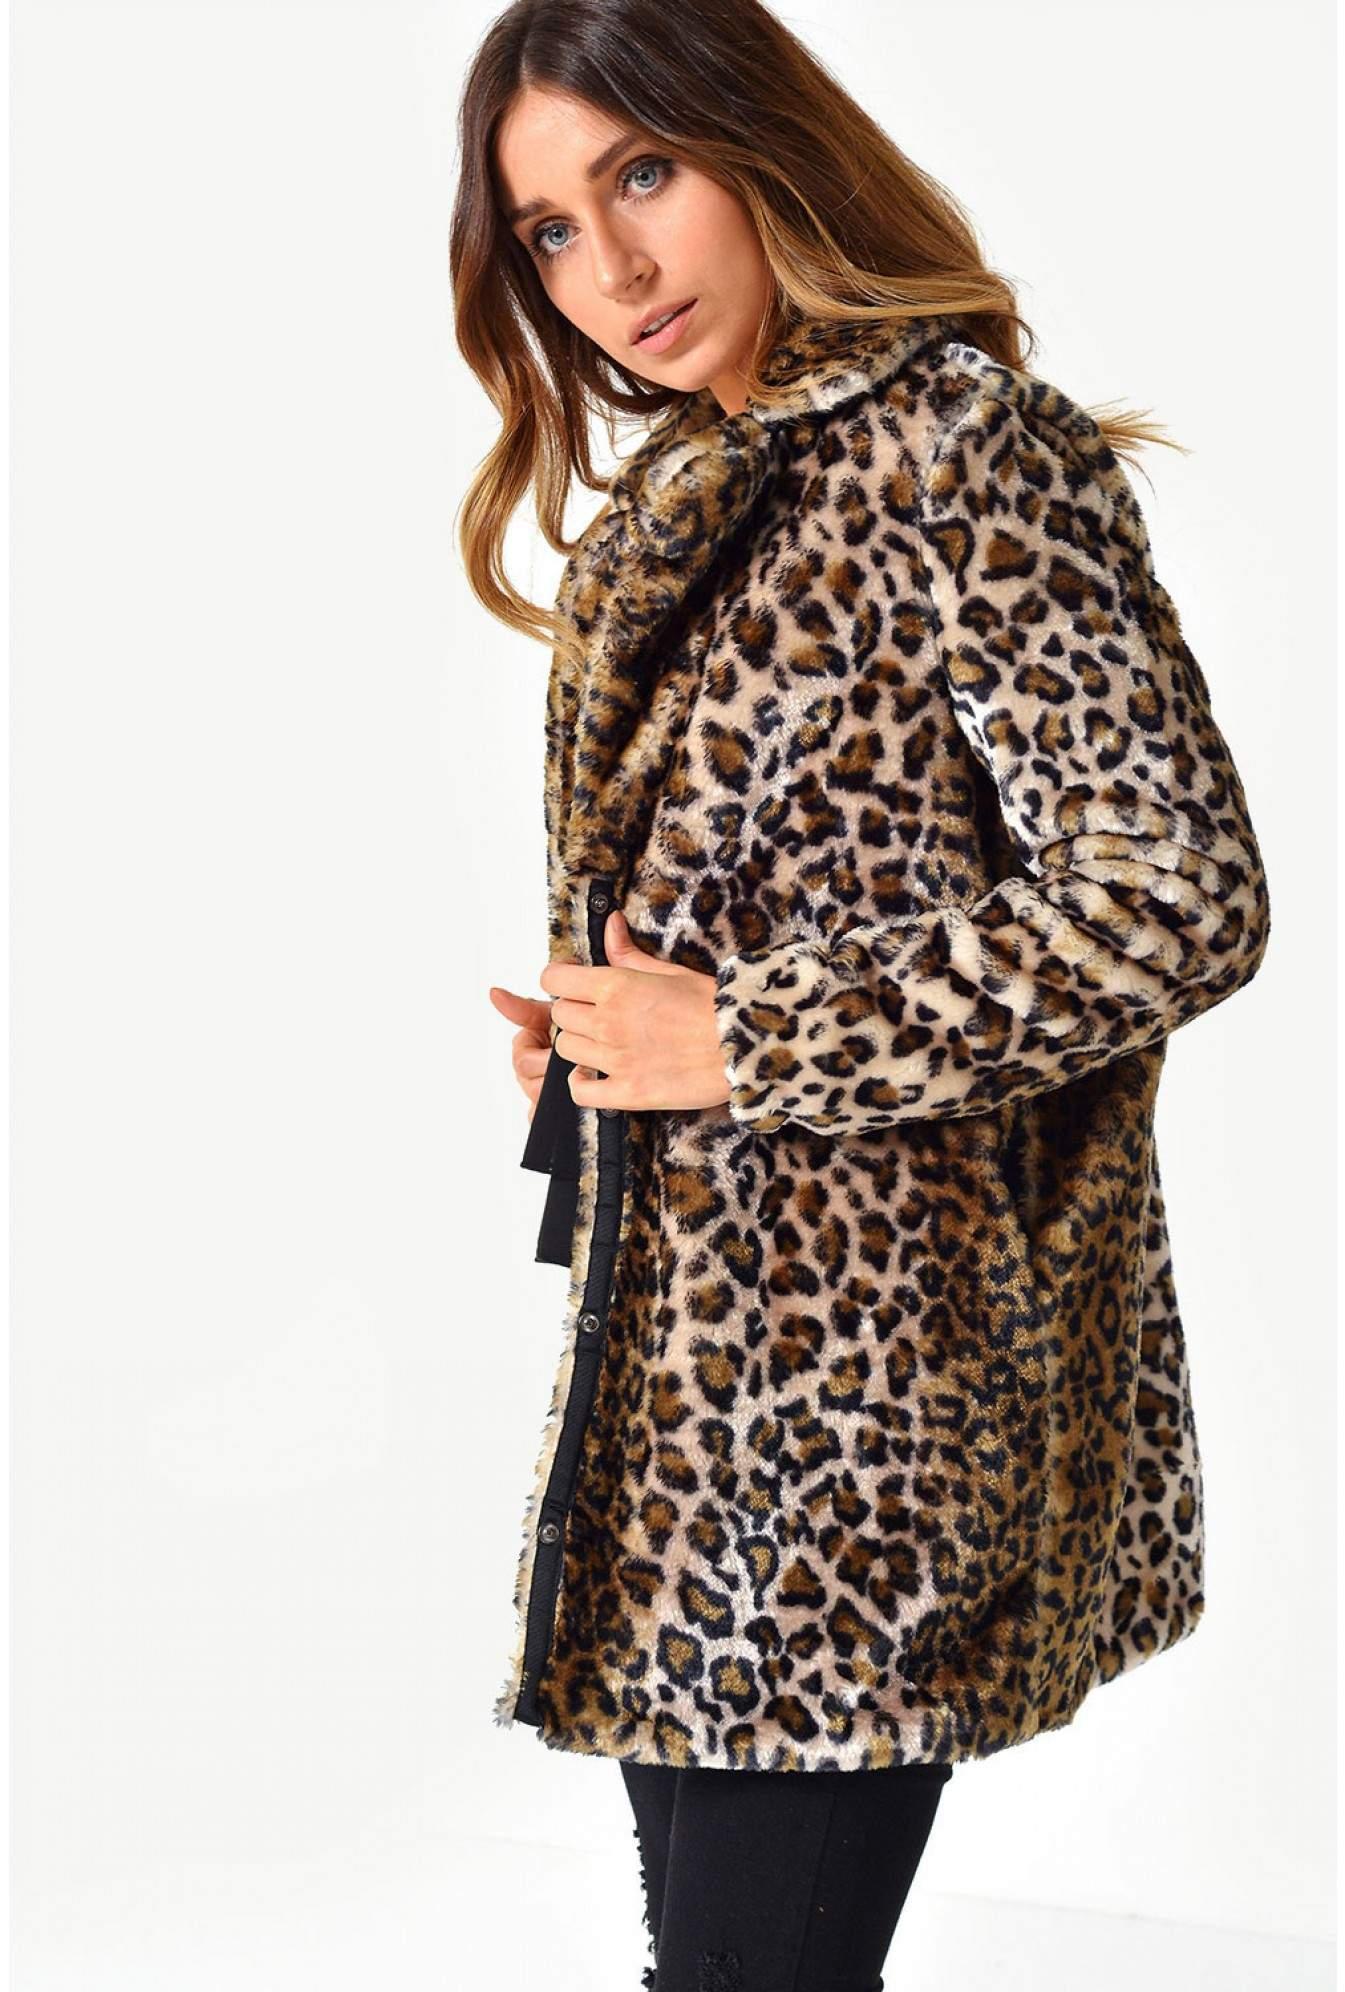 eb44e2b37997 Vero Moda Debora Faux Fur Animal Print Jacket | iCLOTHING